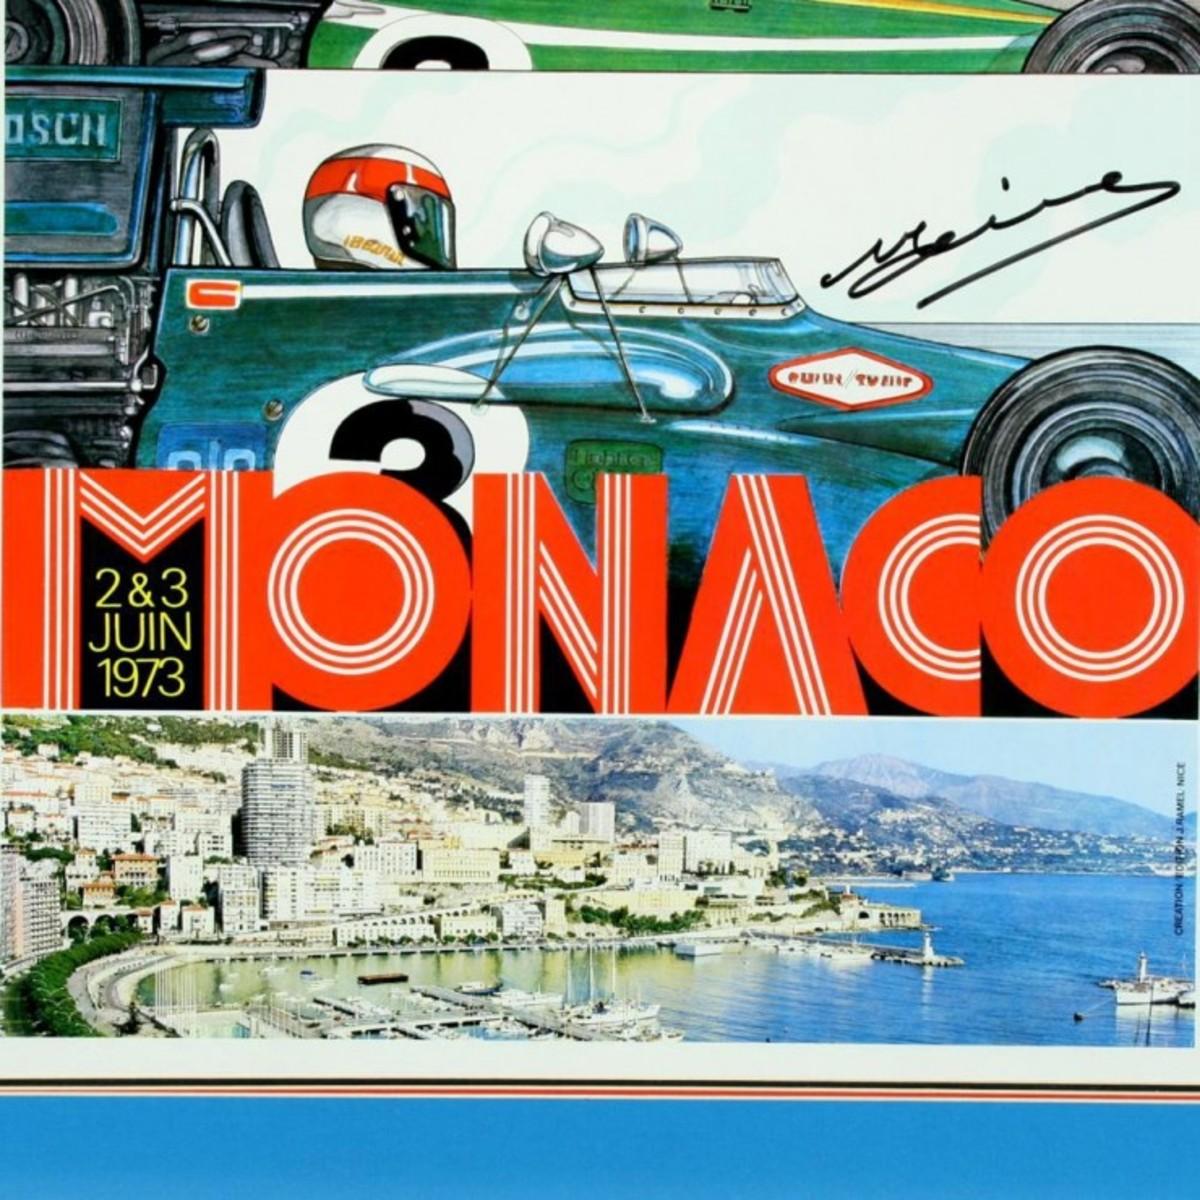 Monaco-Race-Of-Kings-Full-Documentary-740x740